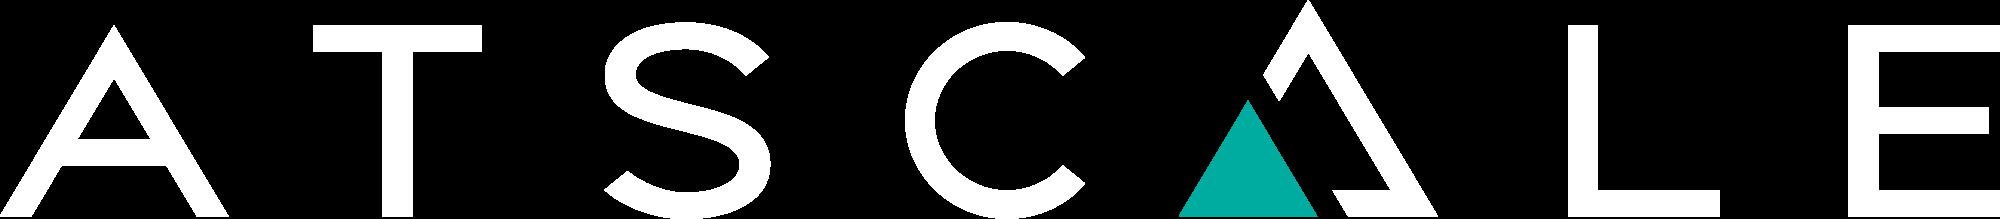 AtScale_Logo_White_Hor_2000px_RGB.png